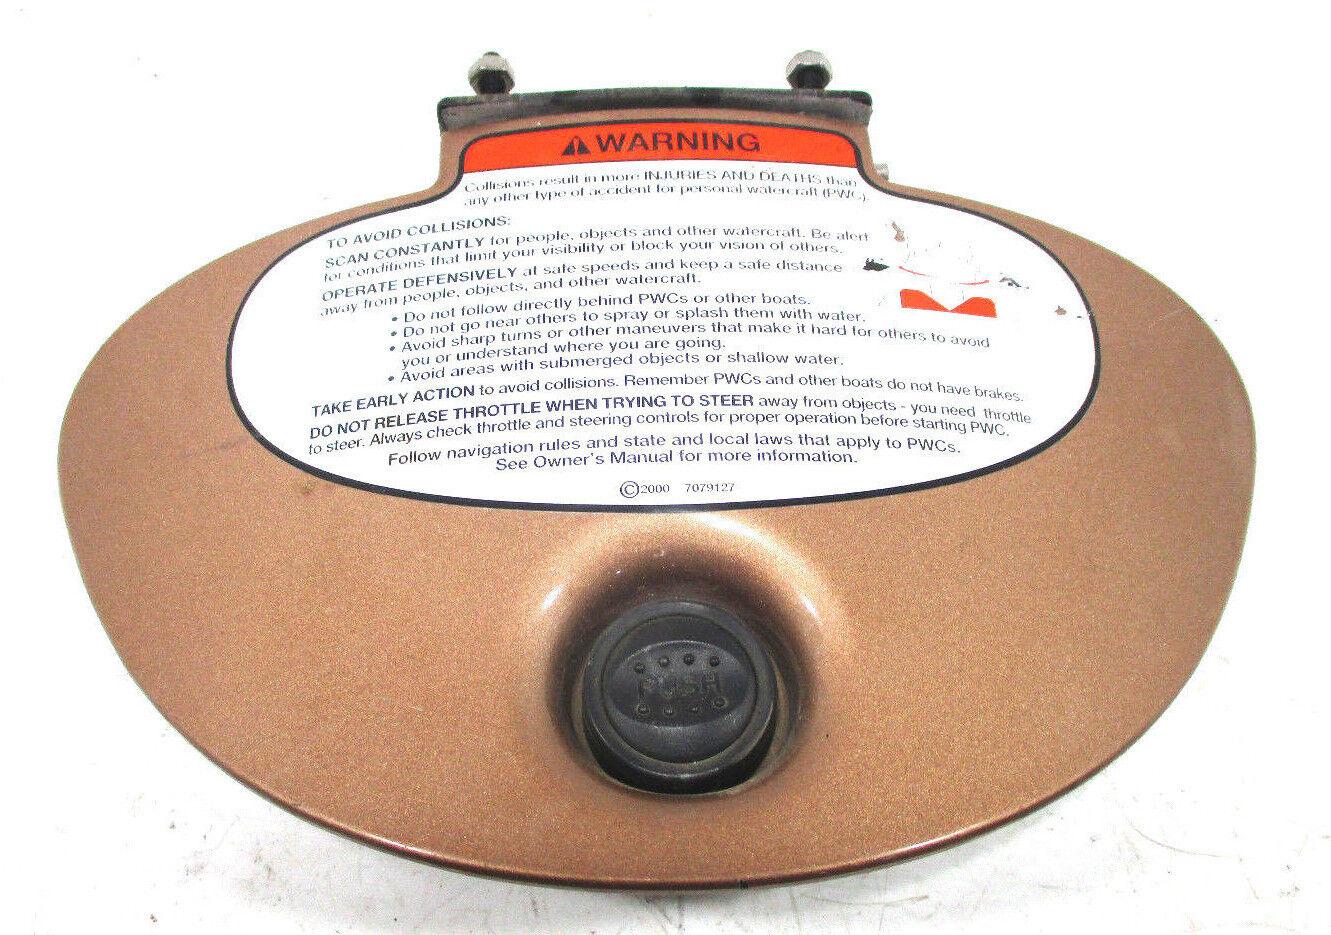 Polaris Glove Box Storage Cover Door (Copper) 2002-2004 Freedom Genesis Virage